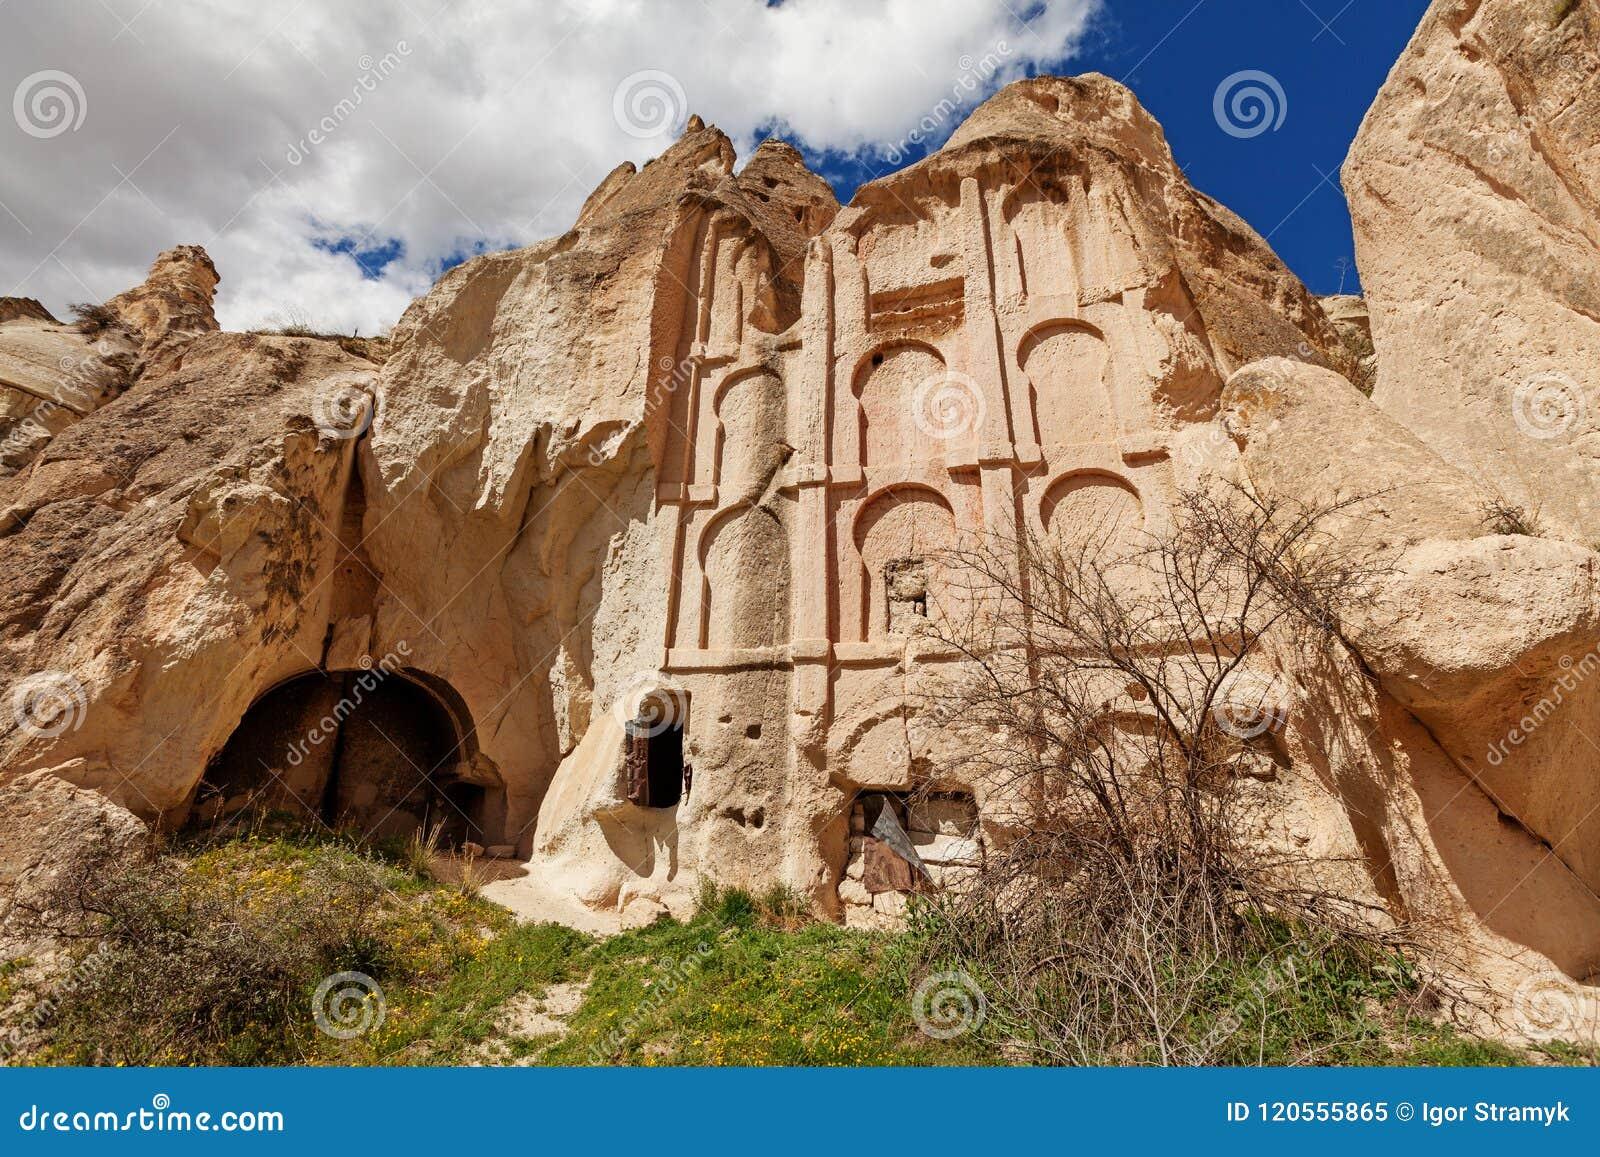 Alter Tempel in den Steinklippen